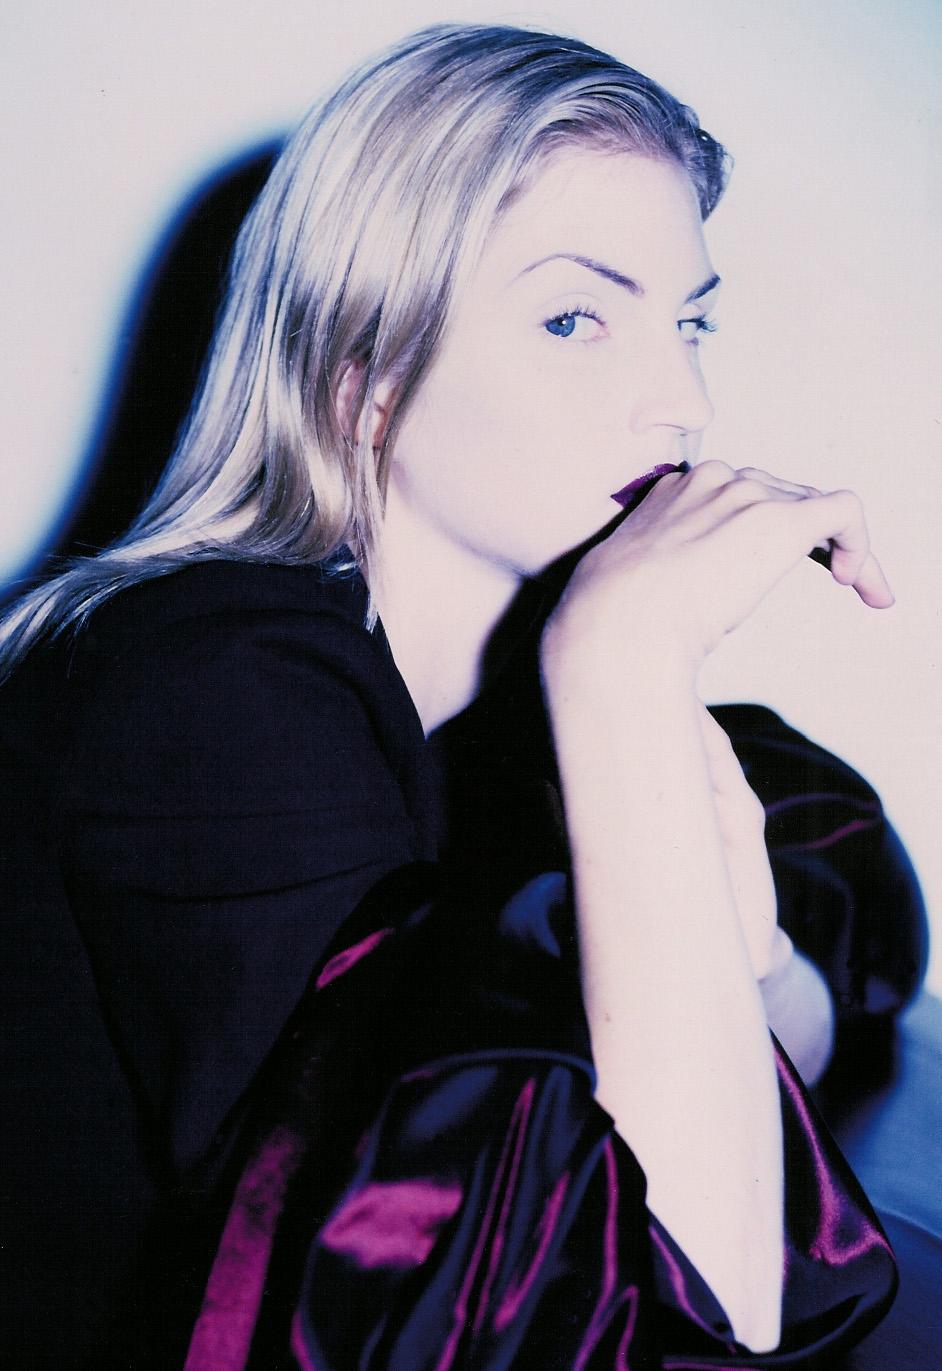 BlondModel.jpg